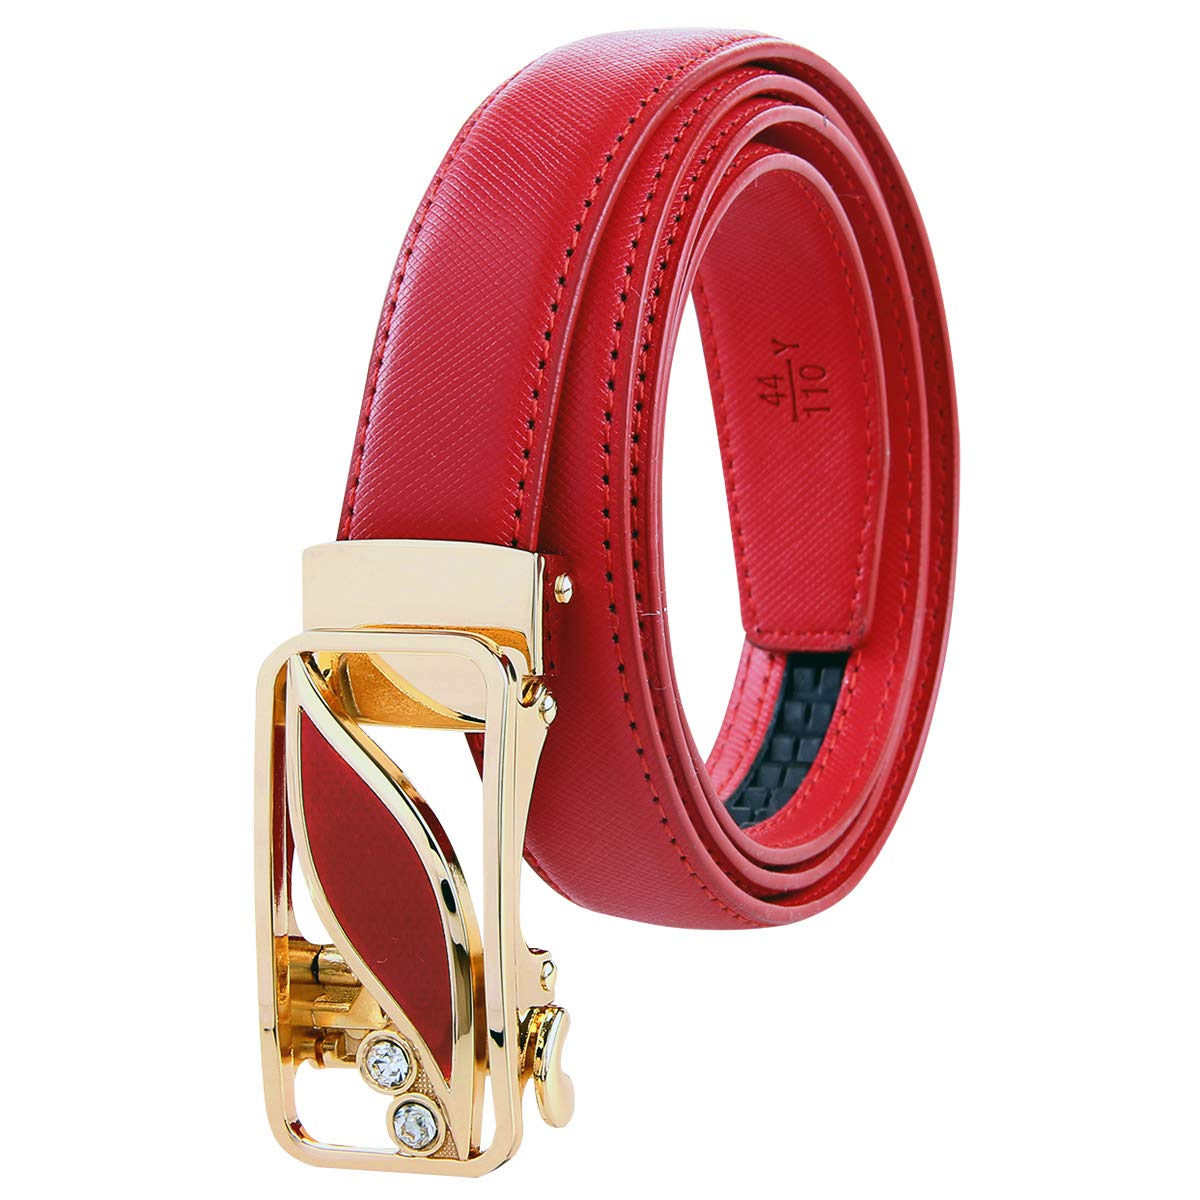 Bpstar Women Ratchet Belt Skinny Leather Strap with Sliding Buckle